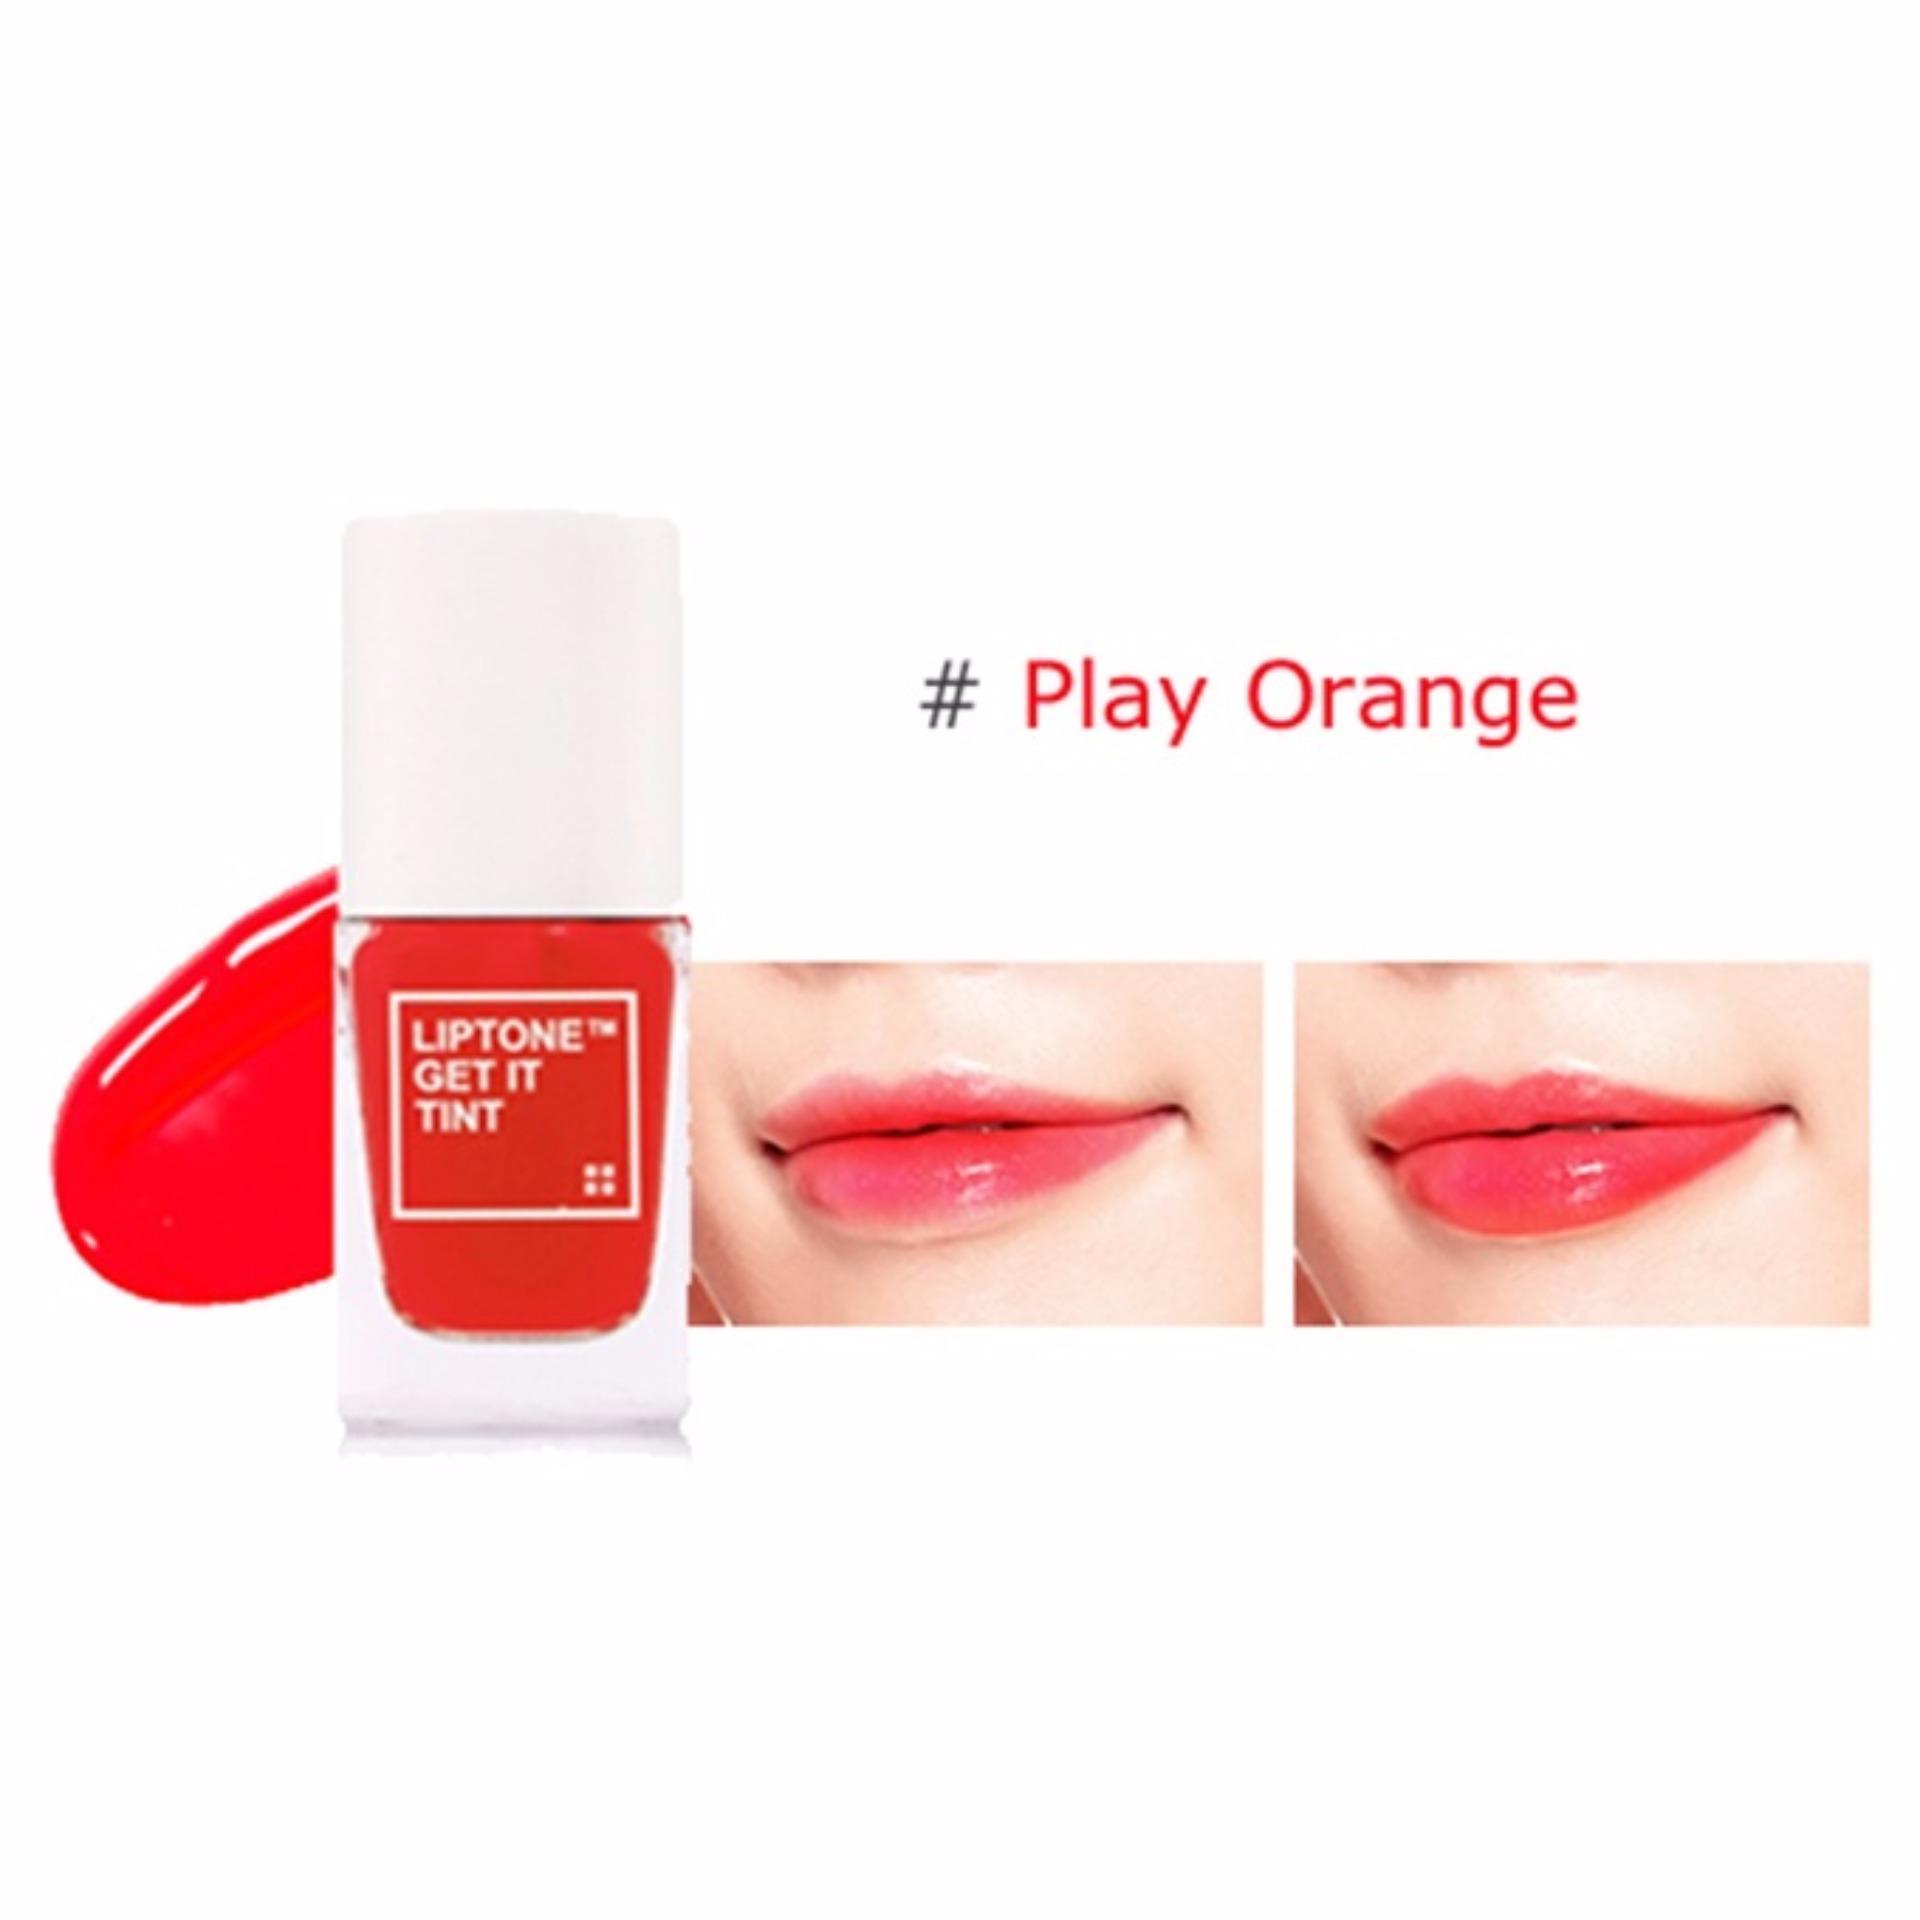 Produk Promo Kim Shop Tonymoly Delight Tint Lip Mini Size Tony Moly Liptint Liptone Get It 03 Play Orange Original 1 Buah